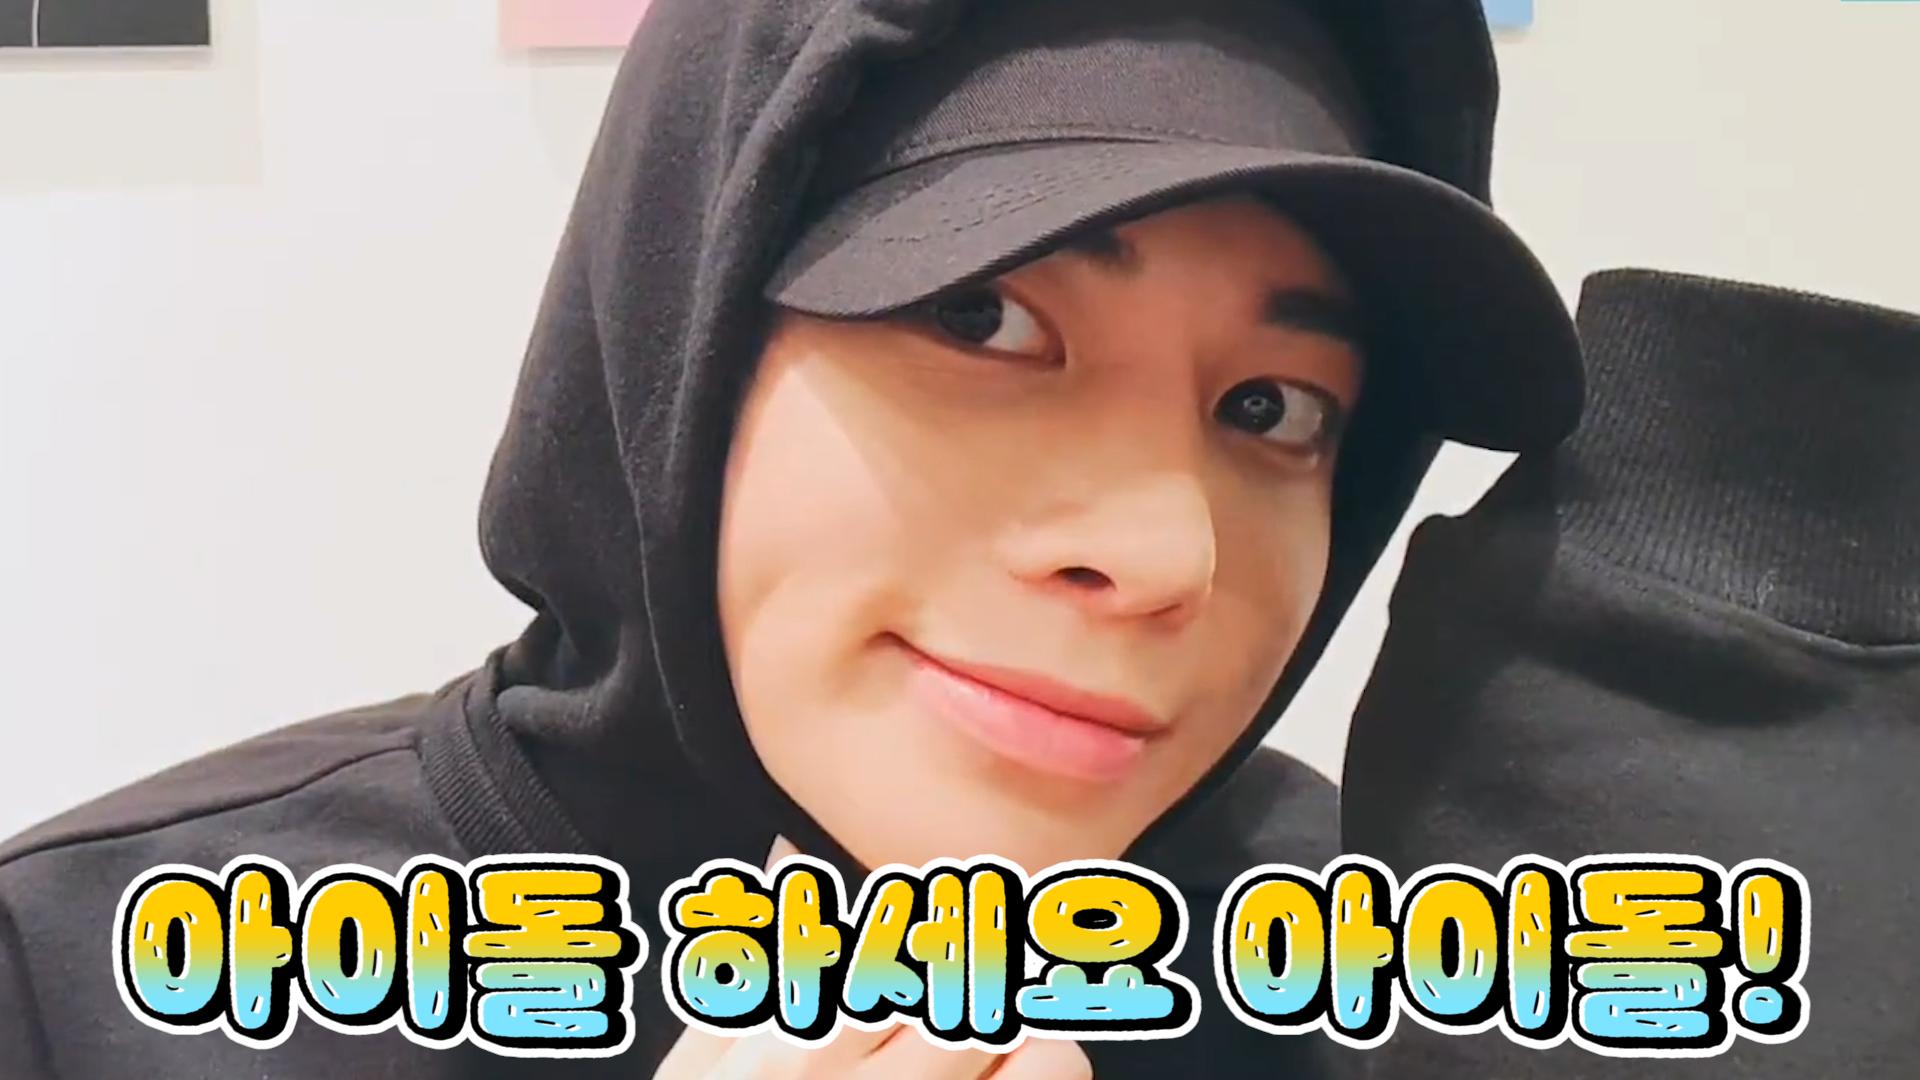 [TXT] 👤: 내가 예뻐서.. 거울보기 힘들어 🐿: 아이돌 하세요! 모두를 힘들게 하세요! (TAEHYUN giving advice to fans)